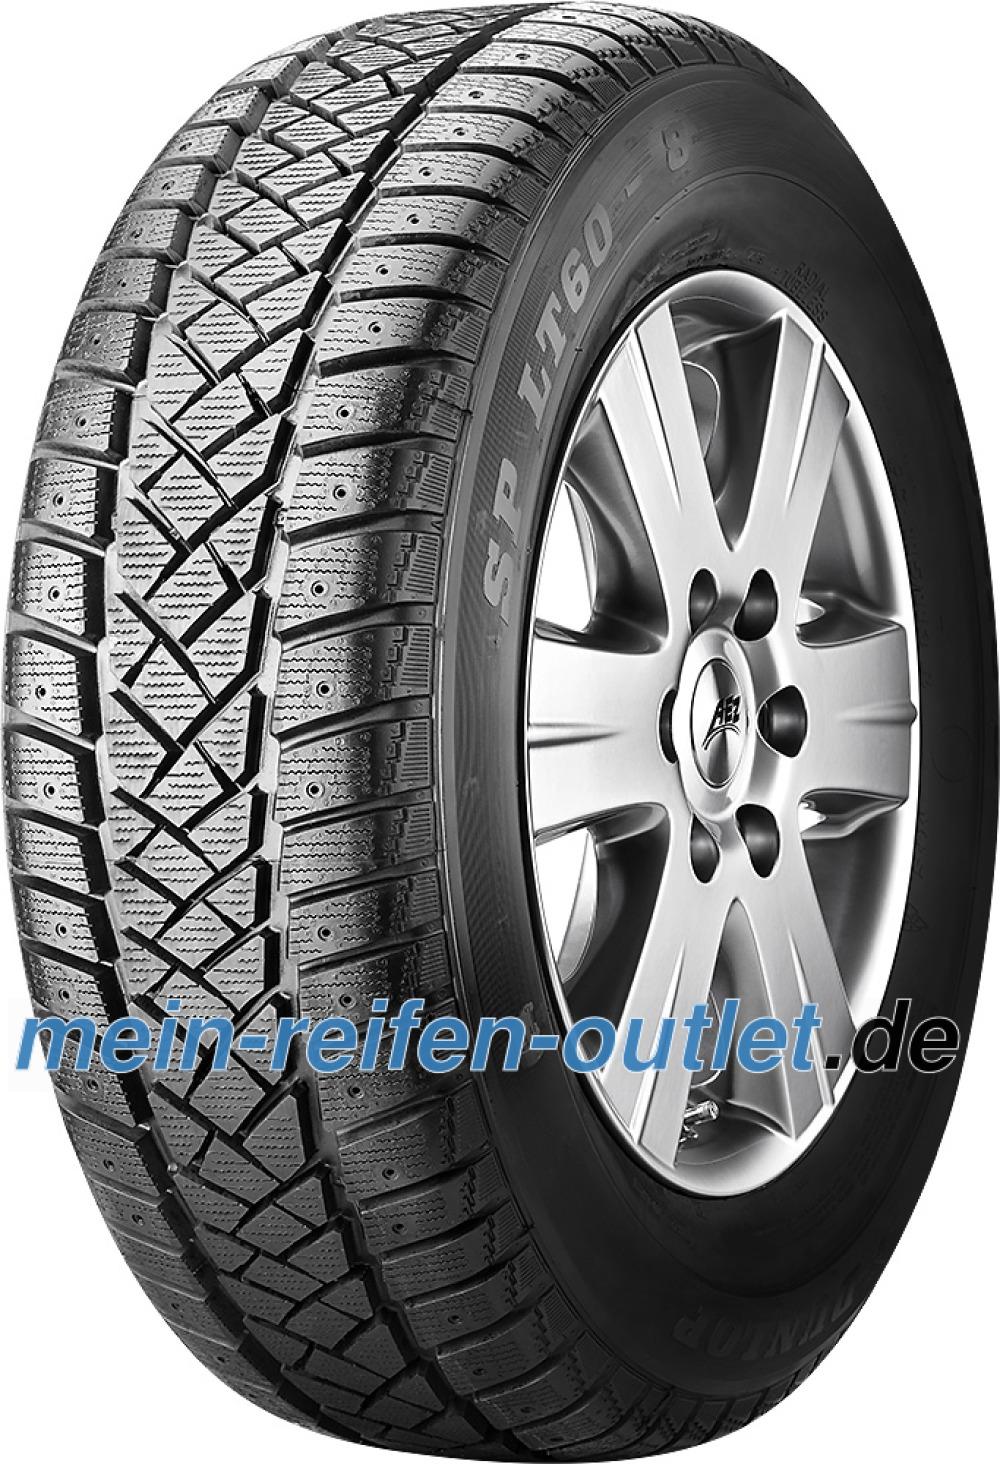 Dunlop SP LT 60 ( 215/75 R16C 113/111R 8PR )